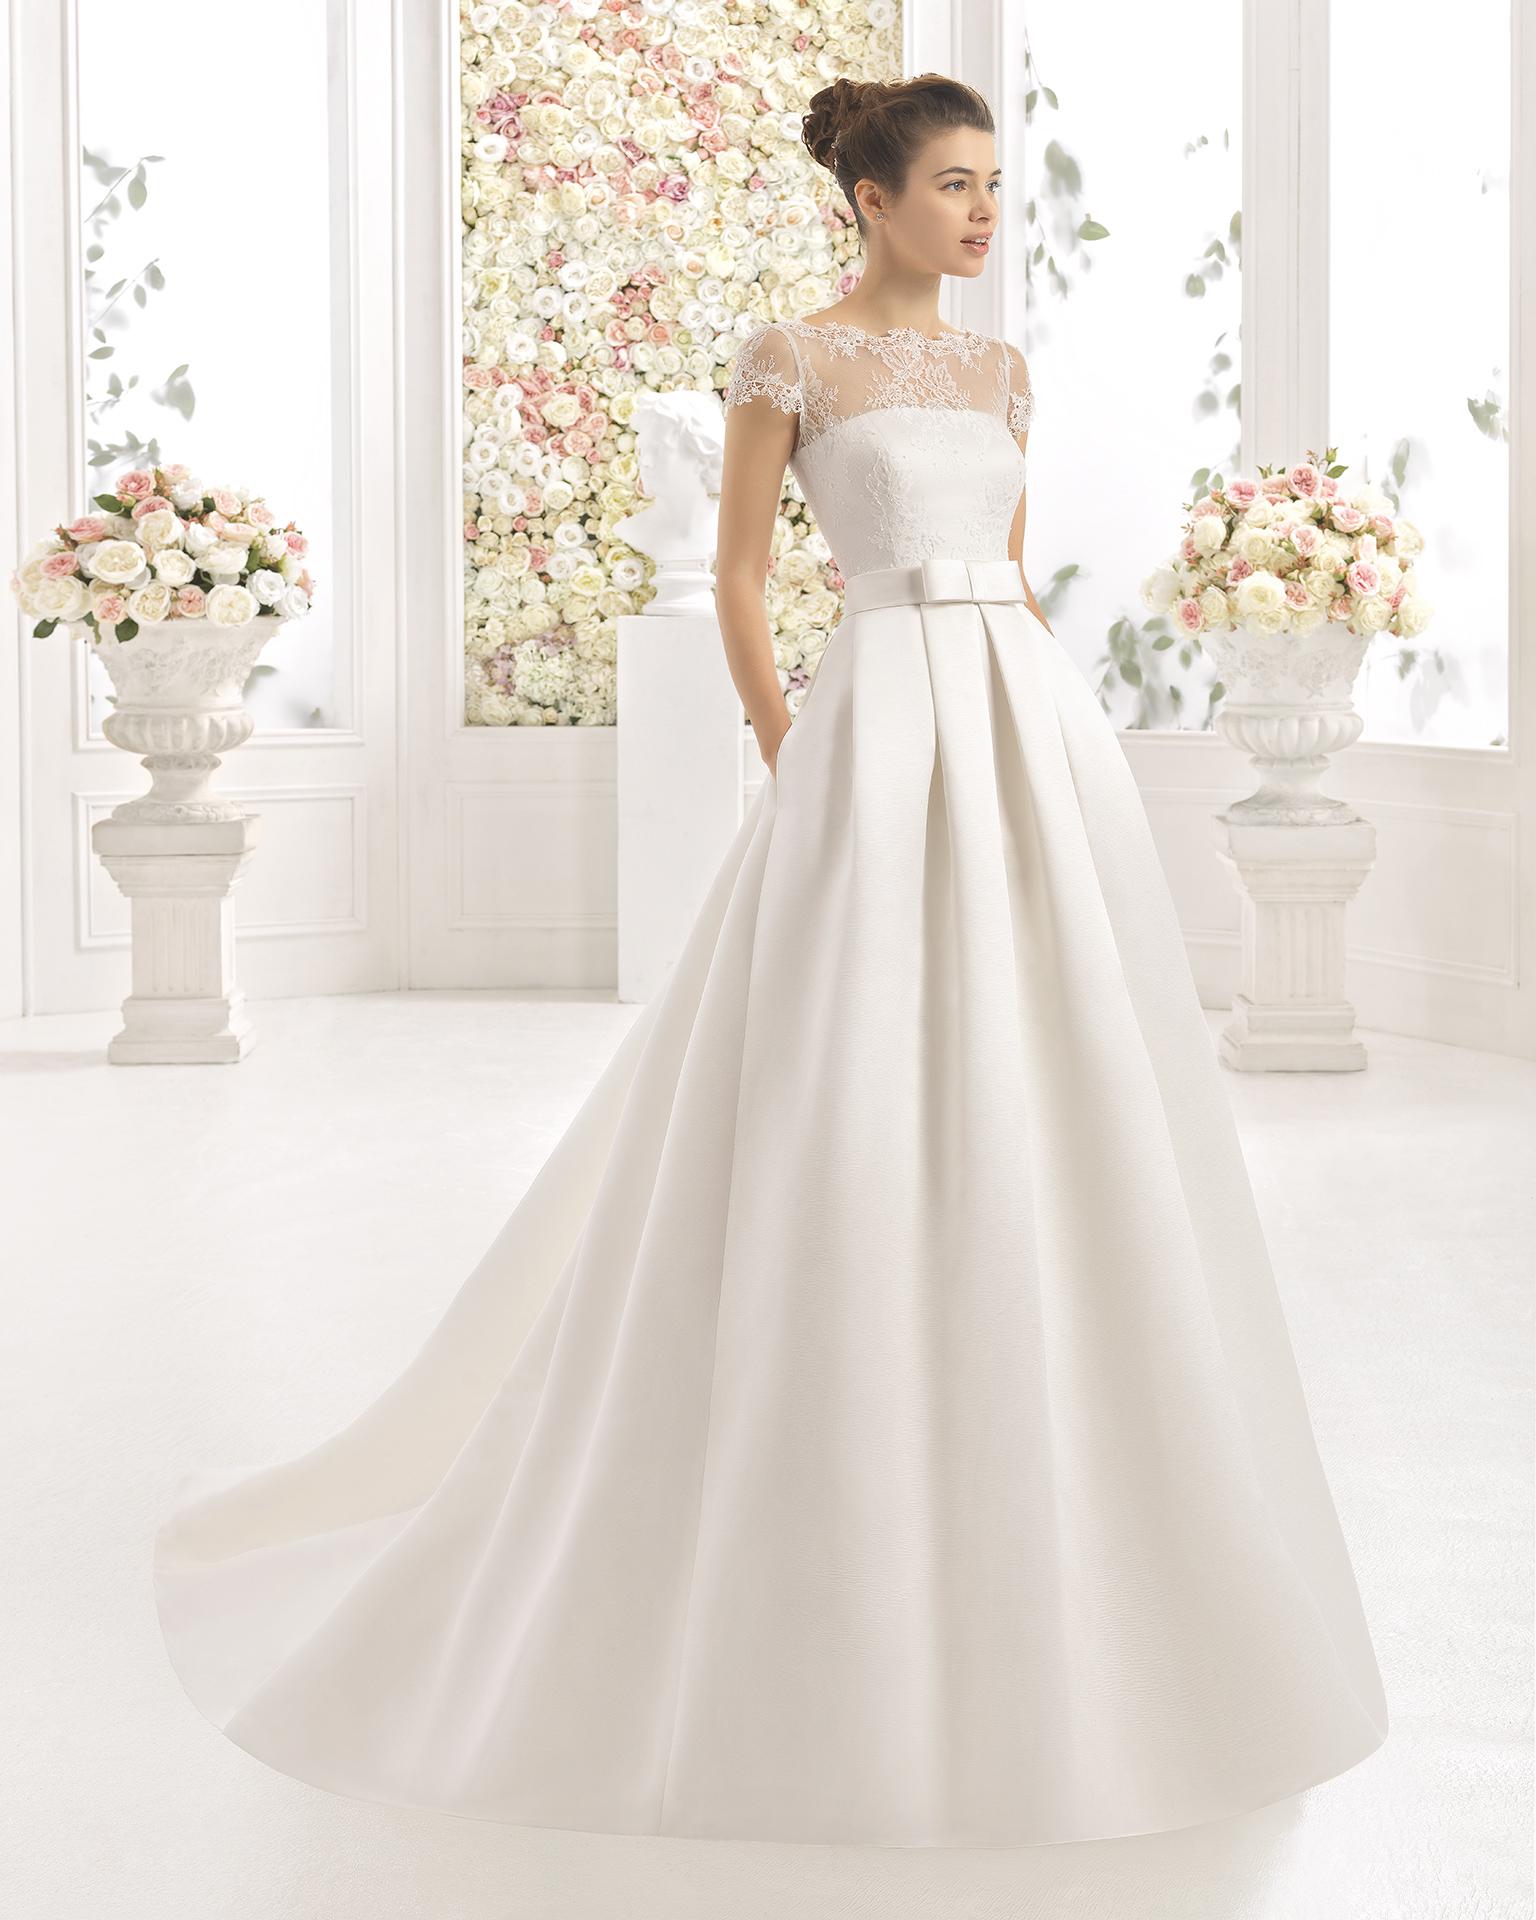 CLADY robe de mariée Aire Barcelona 2017